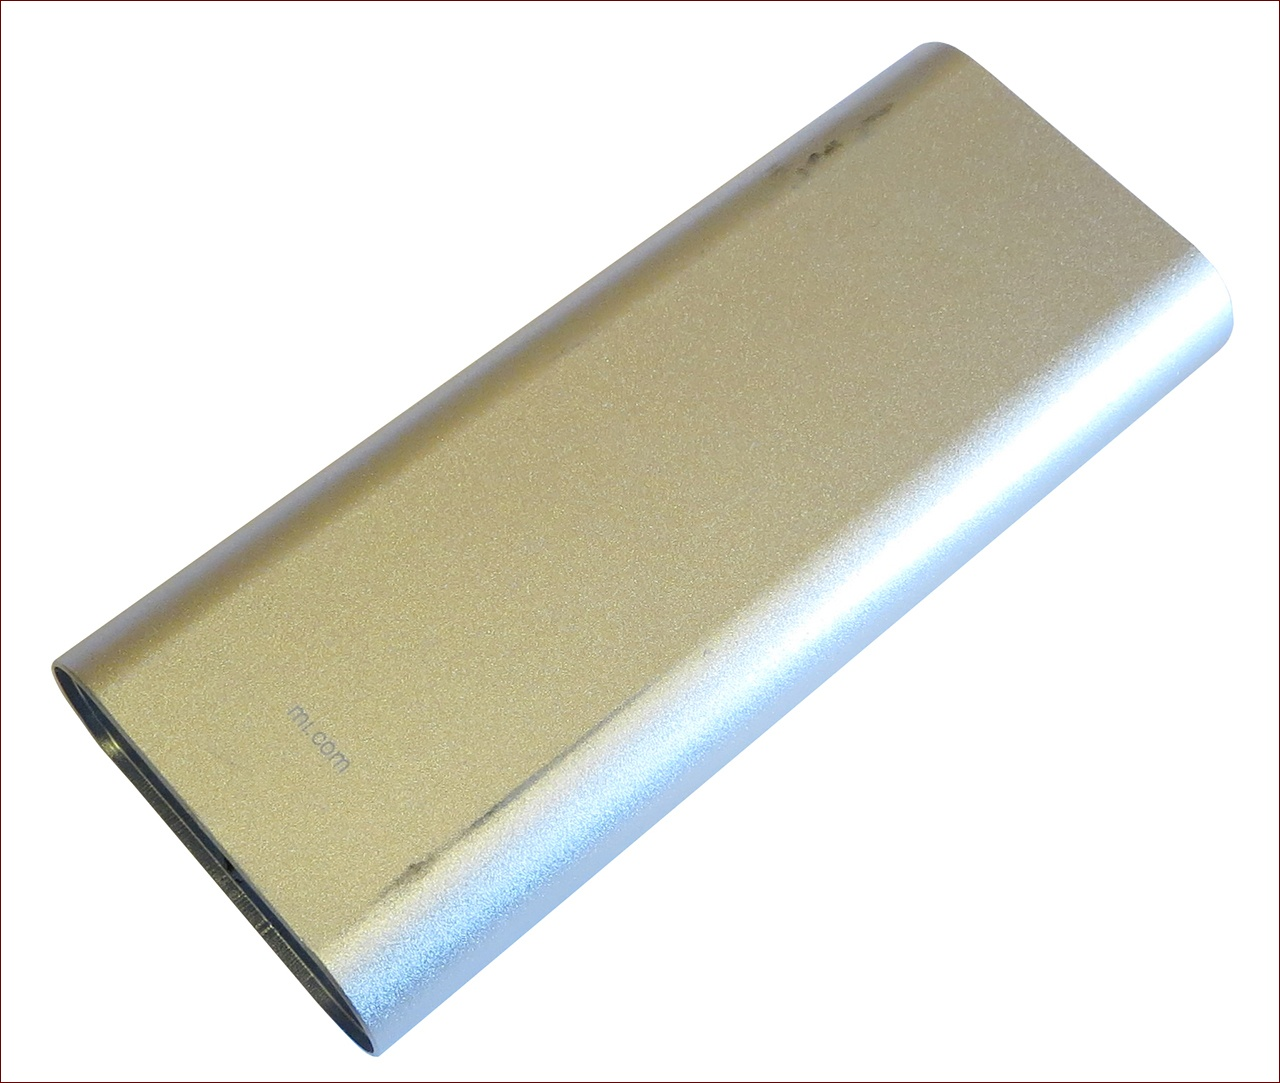 Внешние аккумуляторы HIPER и Xiaomi Mi — взгляд дилетанта - 38